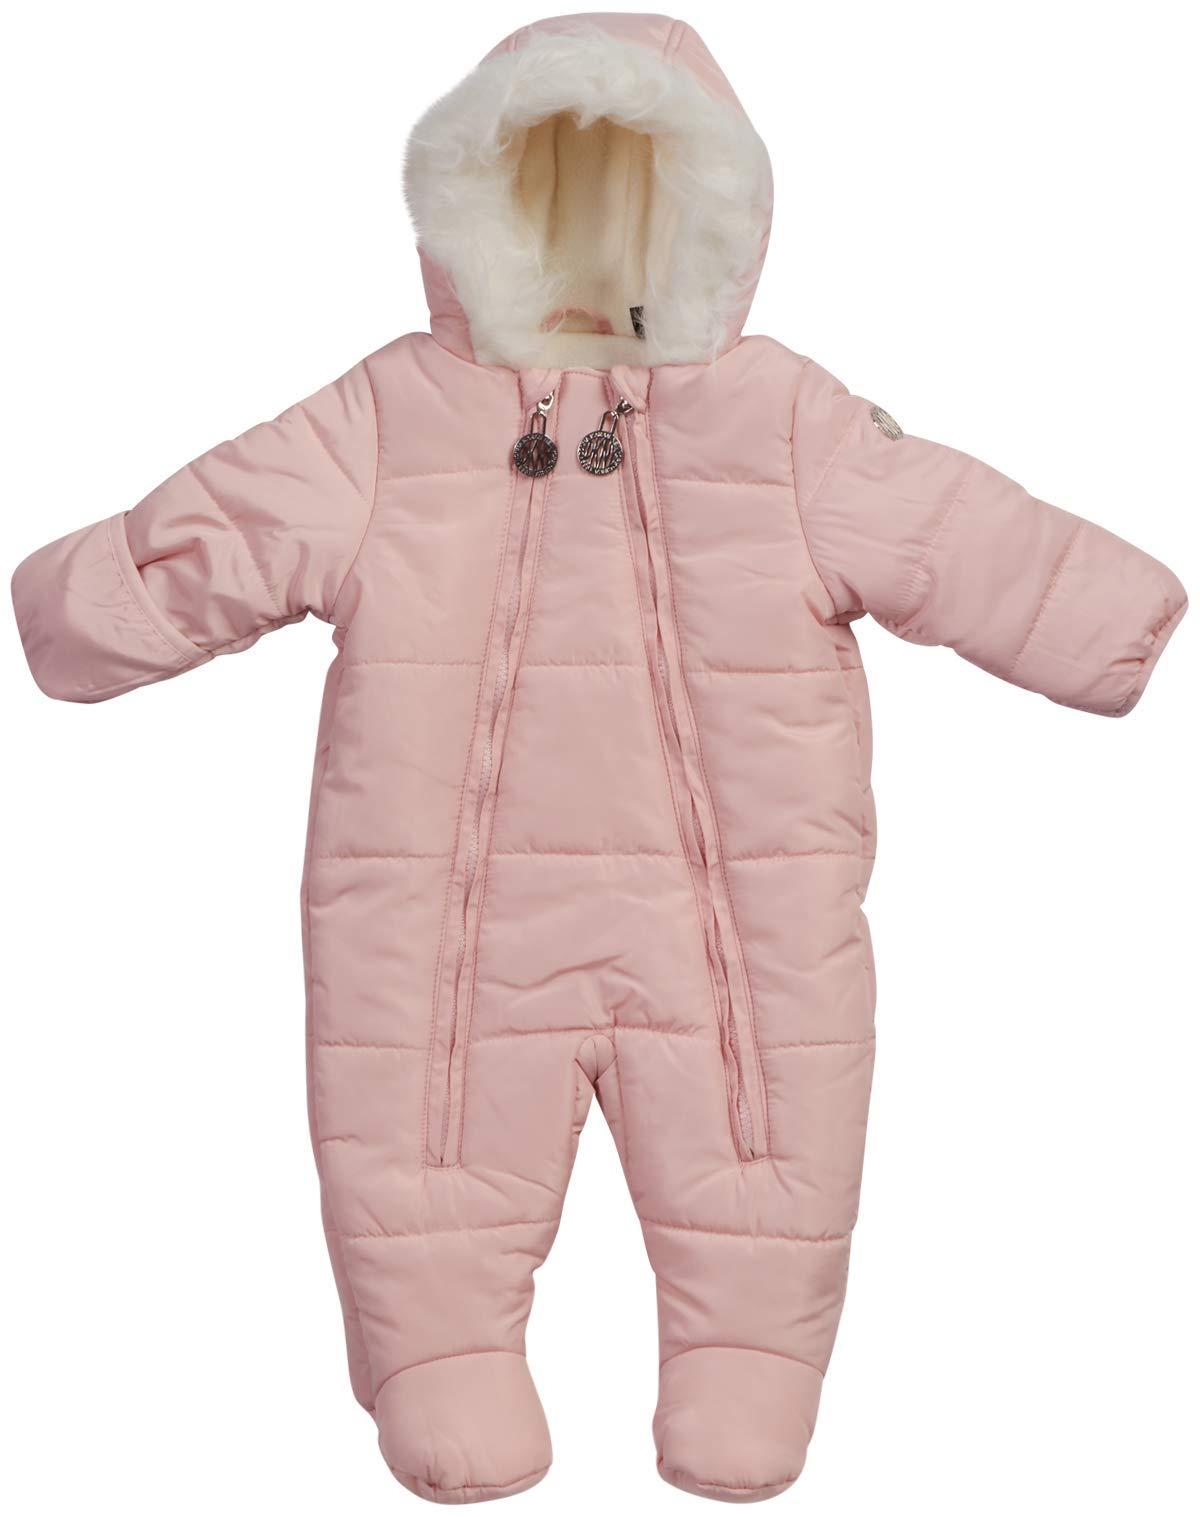 DKNY Baby Girls' Cozy Puffer Snowsuit Pram with Fur Trim, Size 6-9 Months, Blush' by DKNY